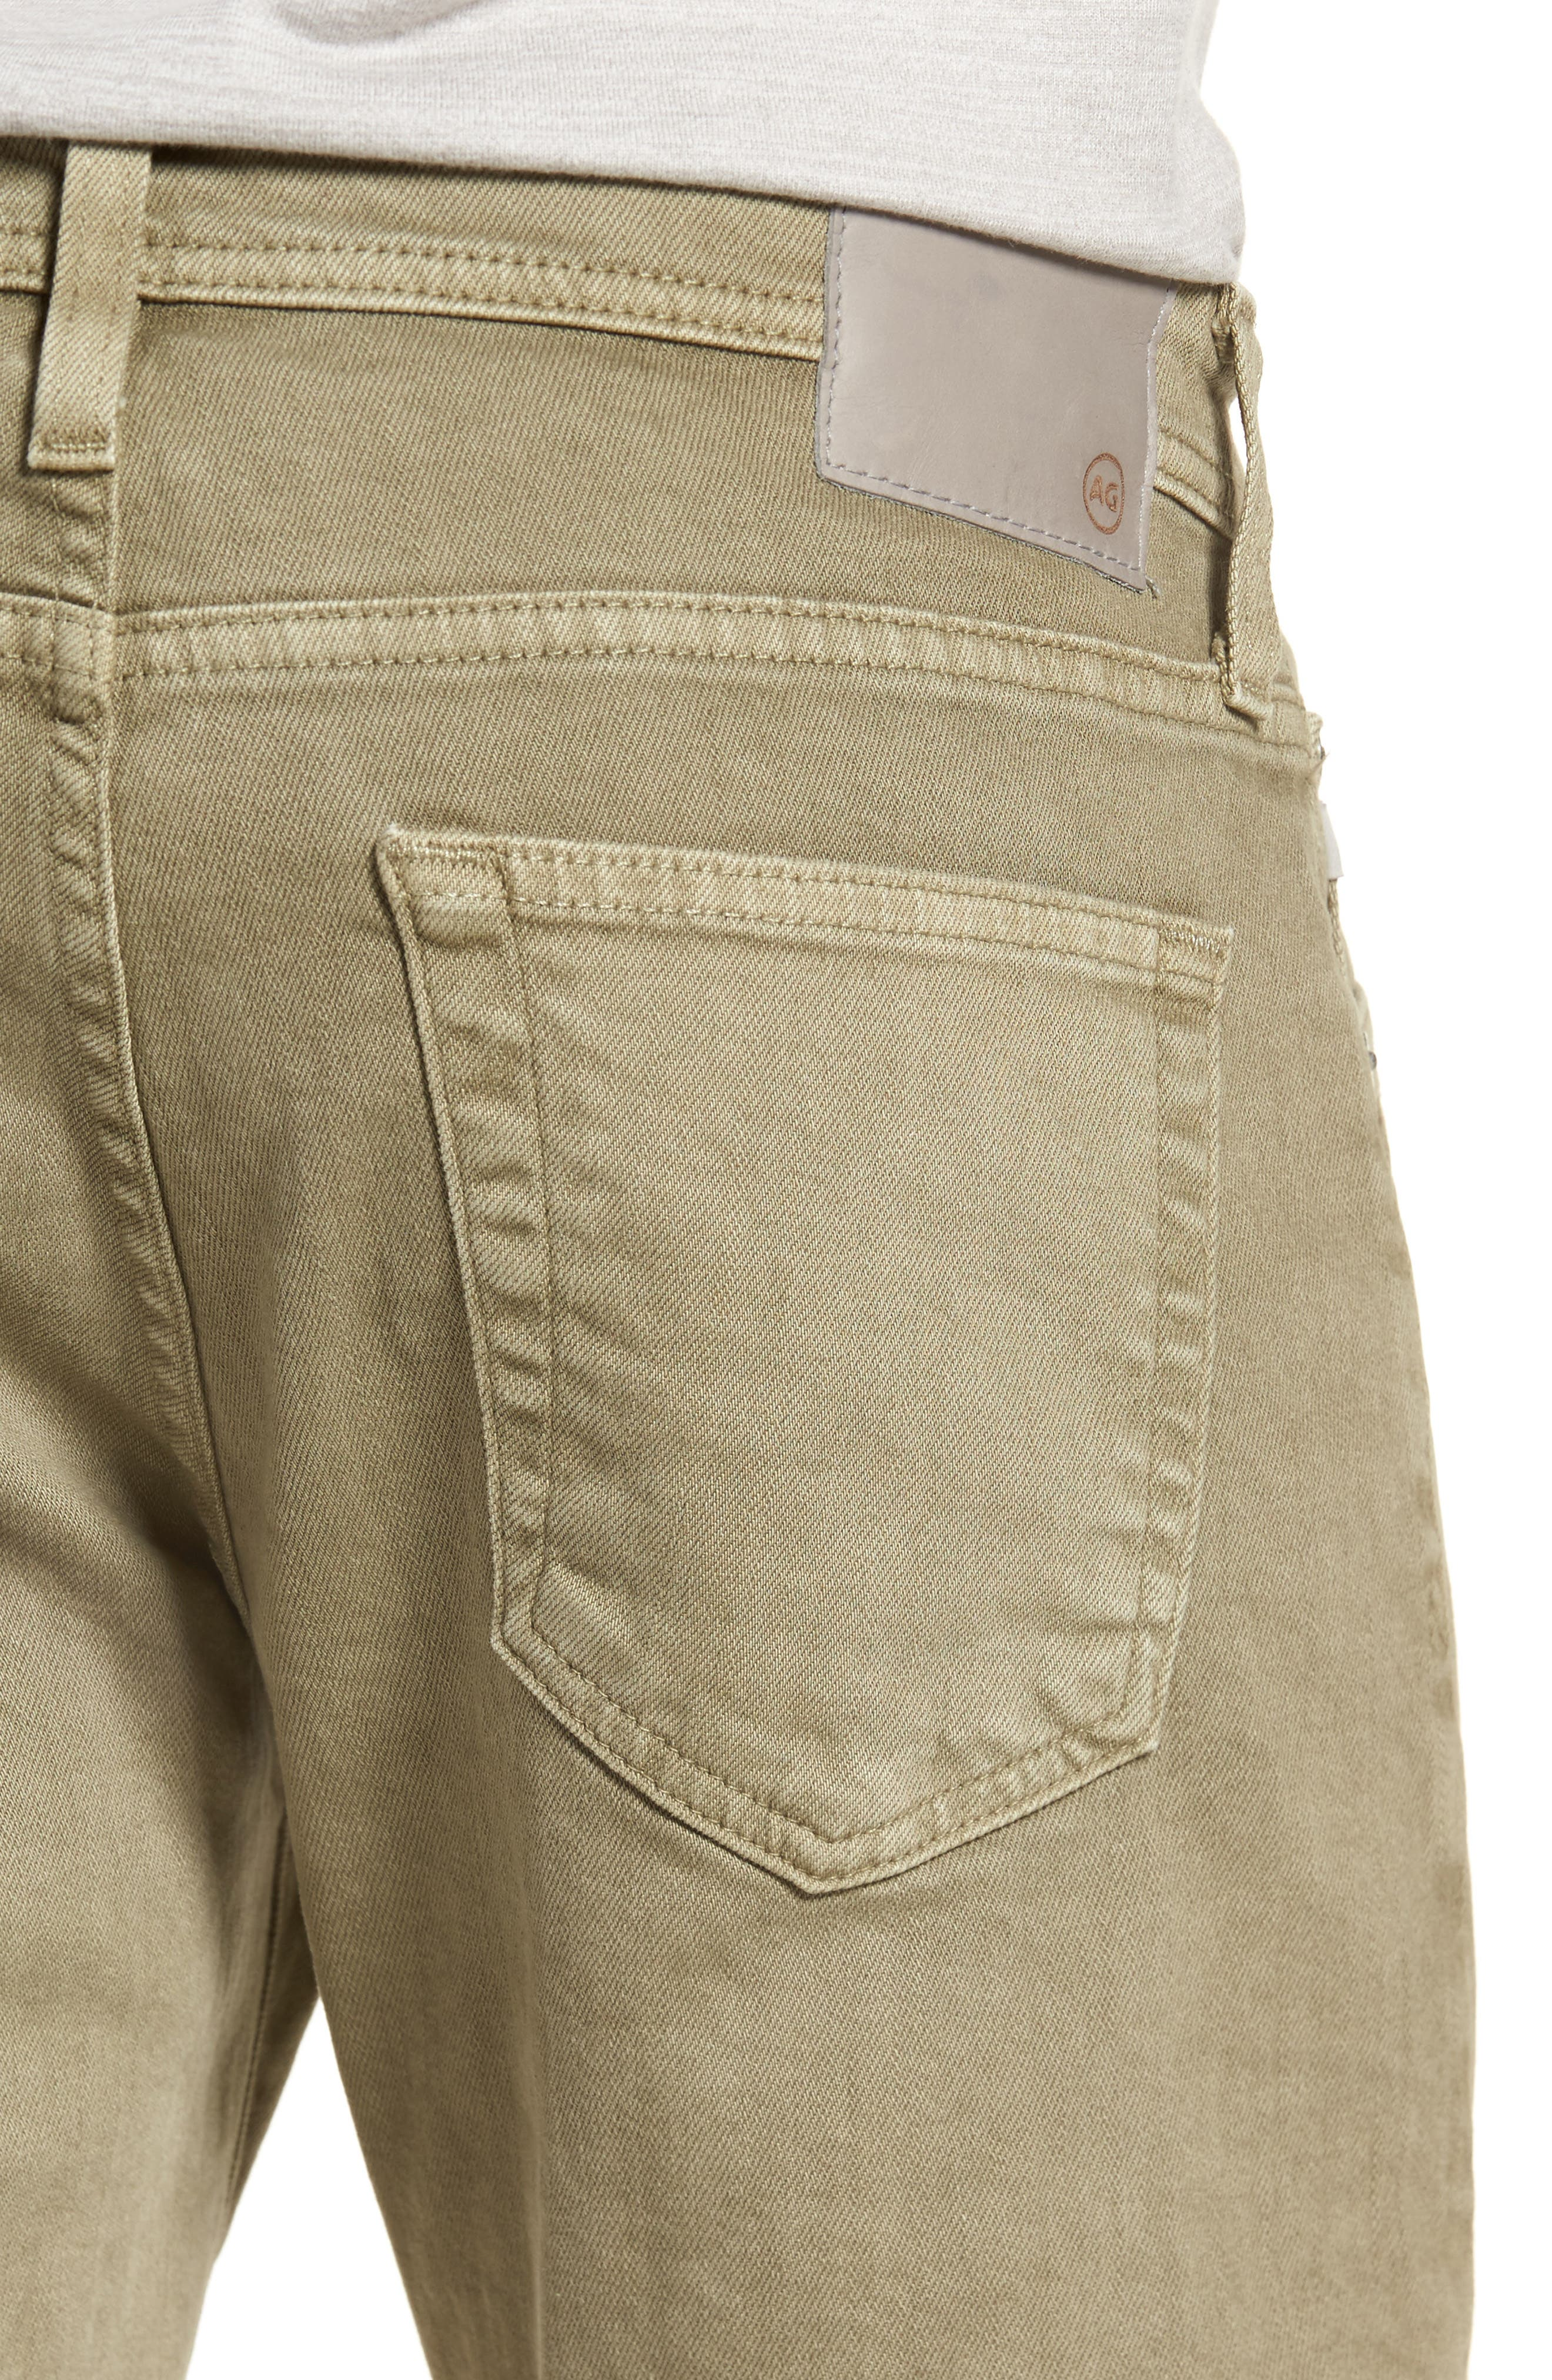 Tellis Slim Fit Jeans,                             Alternate thumbnail 4, color,                             7 Years Dry Cypress